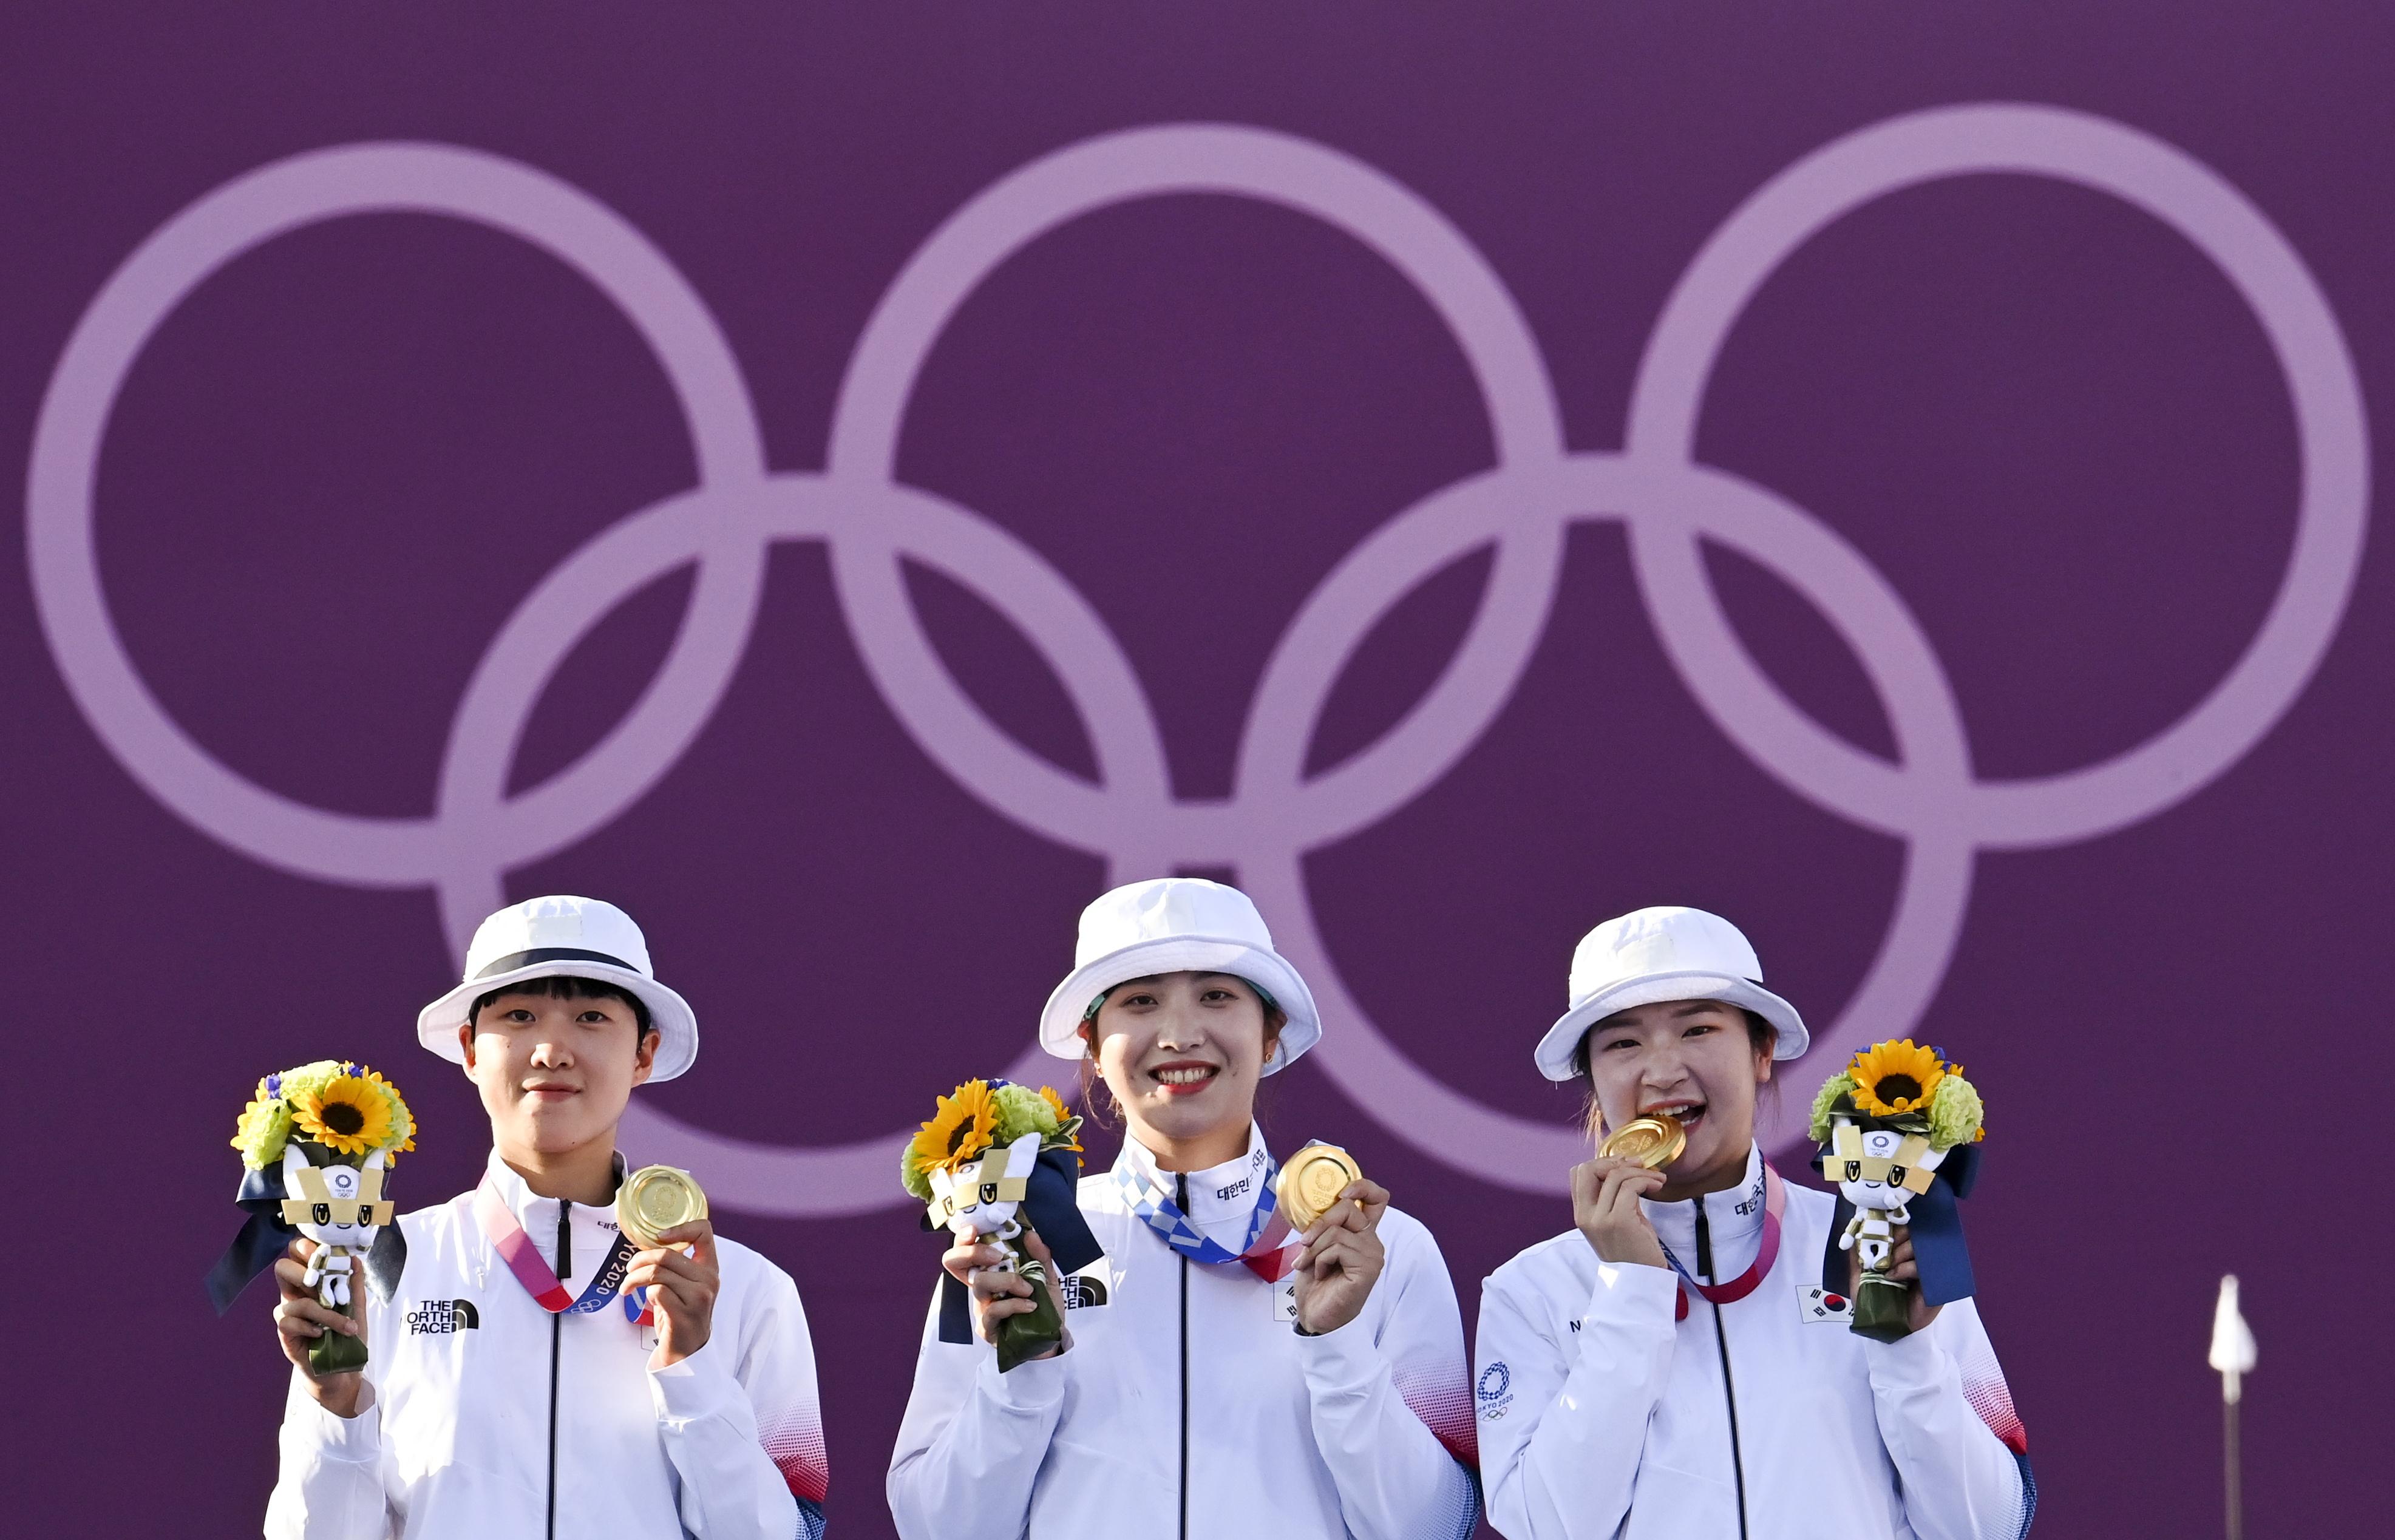 Tokyo 2020 Olympics - Archery - Women's Team - Medal Ceremony – Yumenoshima Archery Field, Tokyo, Japan July 25, 2021. Gold medallist An San of South Korea, gold medallist Jang Minhee of South Korea and gold medallist Kang Chae Young of South Korea celebrate on the podium. REUTERS/Clodagh Kilcoyne/File photo